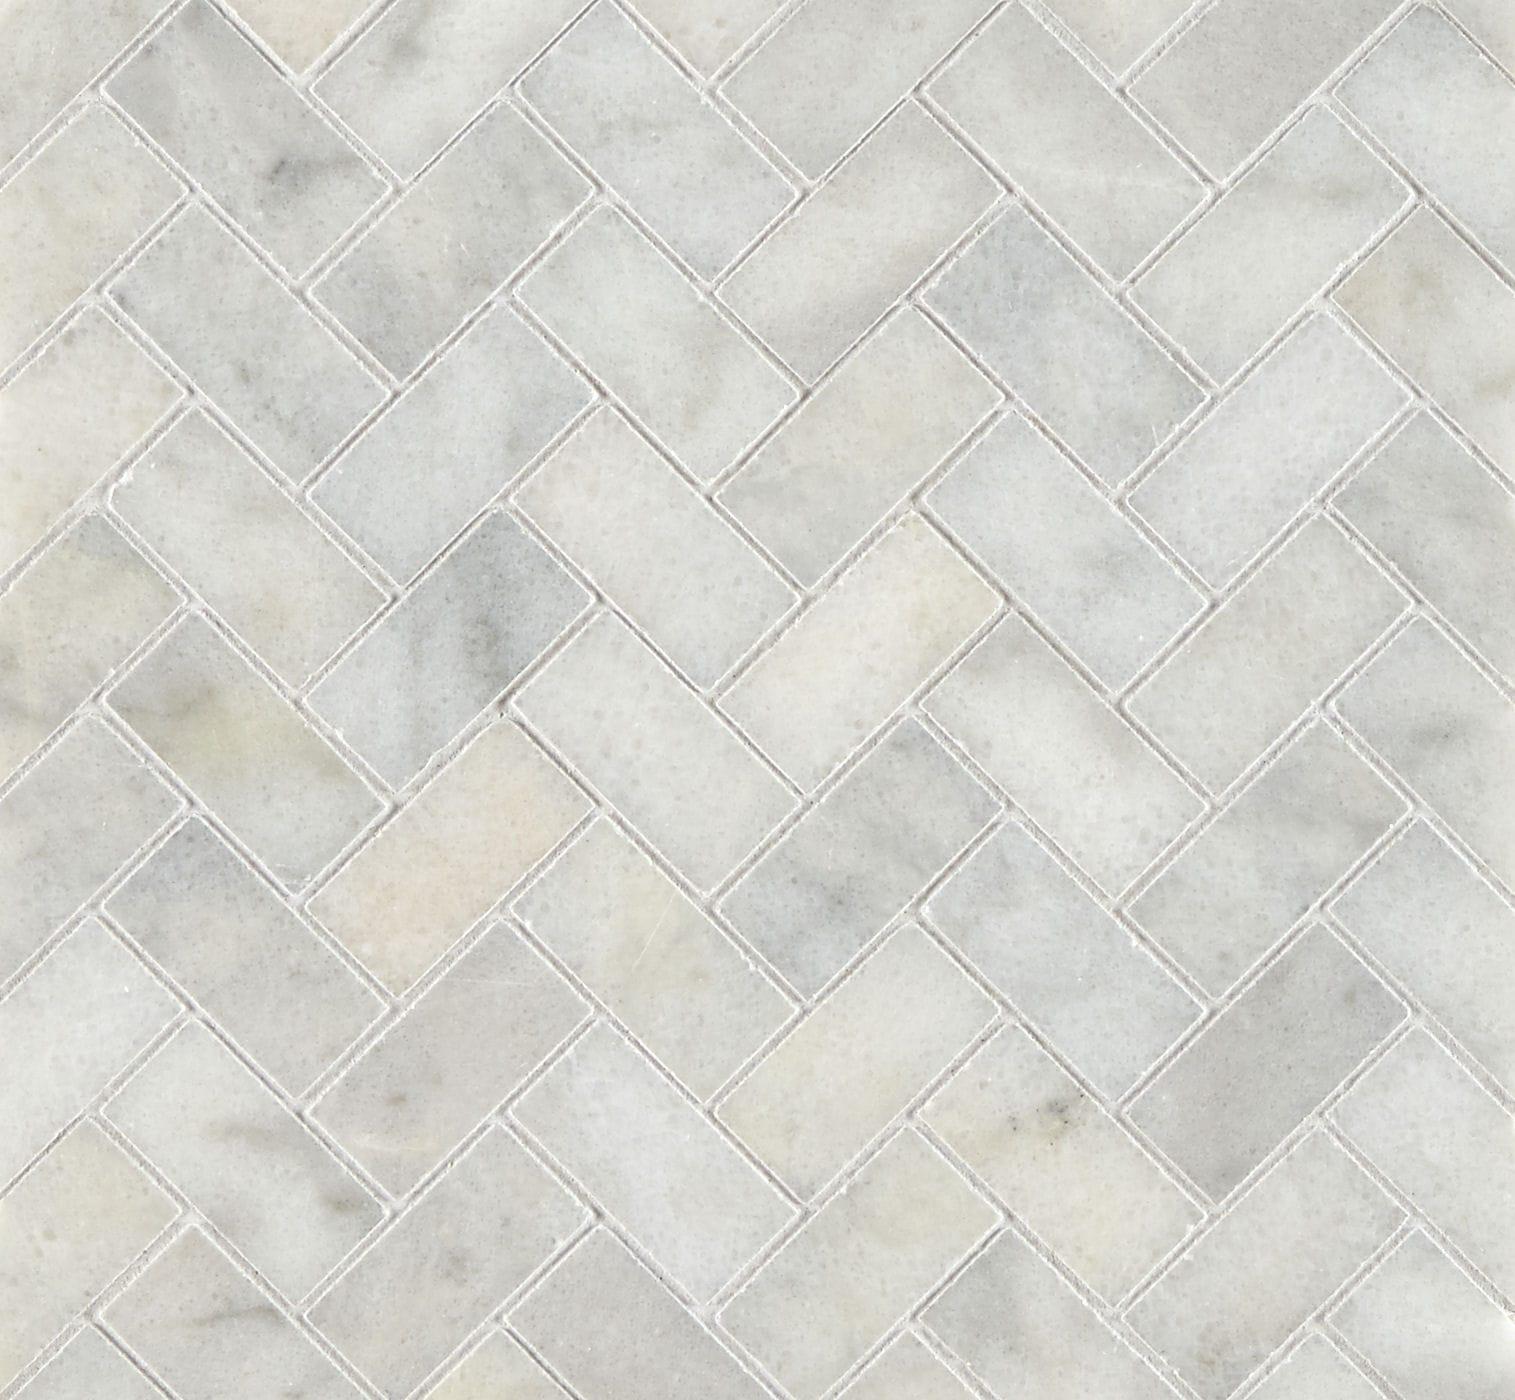 Calacatta Honed Marble Herringbone Mosaic Tiles Mandarin